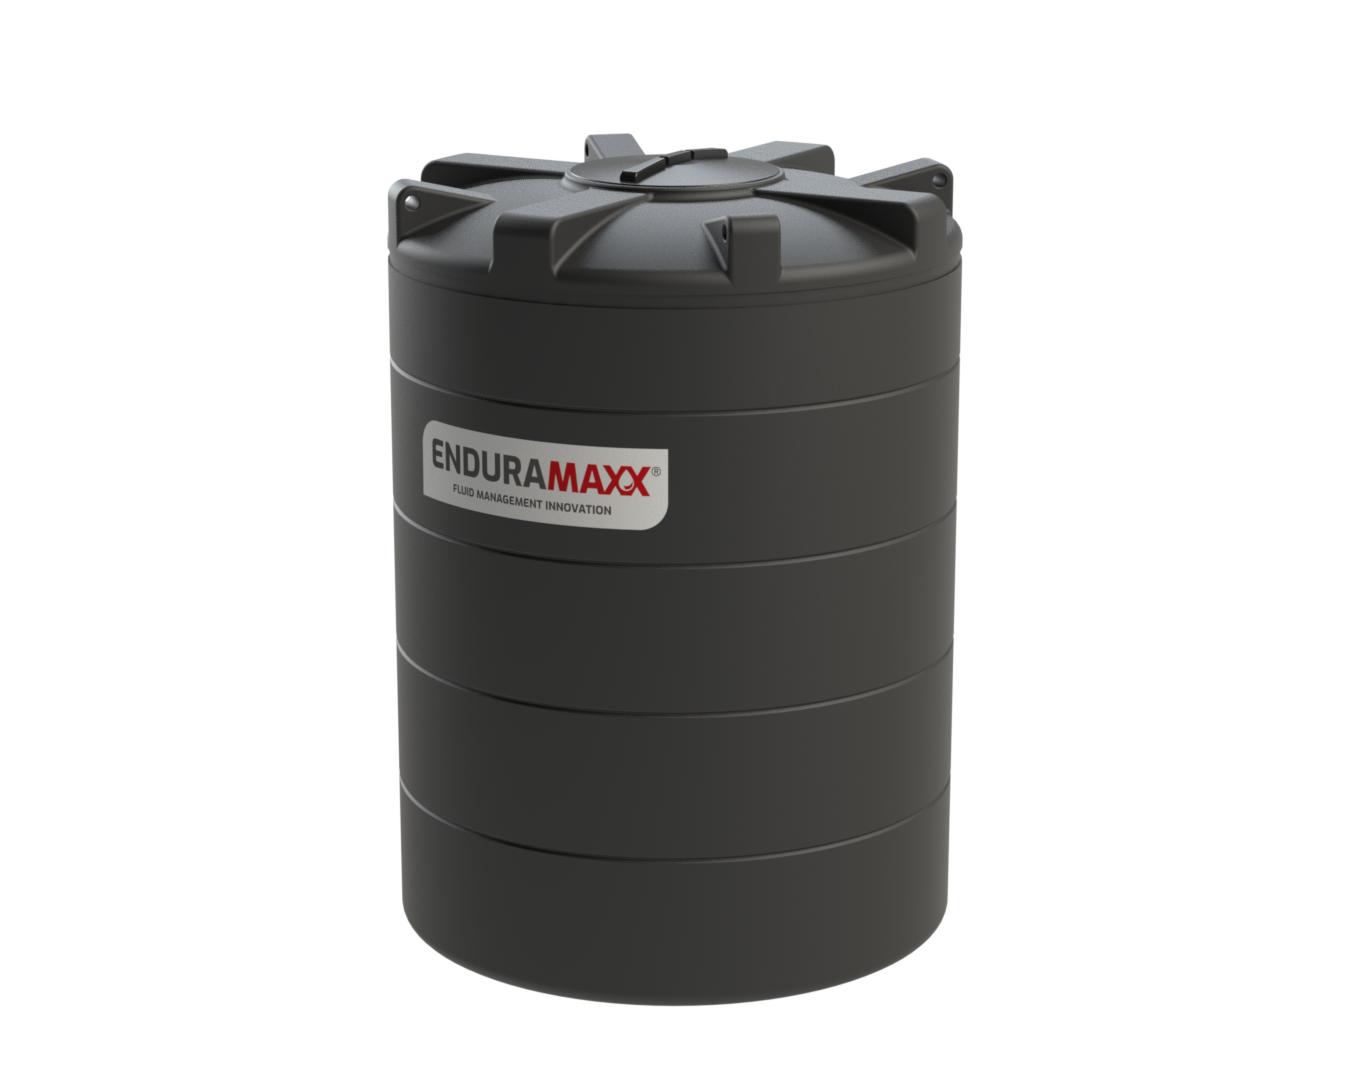 4,500 Litre Rainwater Harvesting Tank